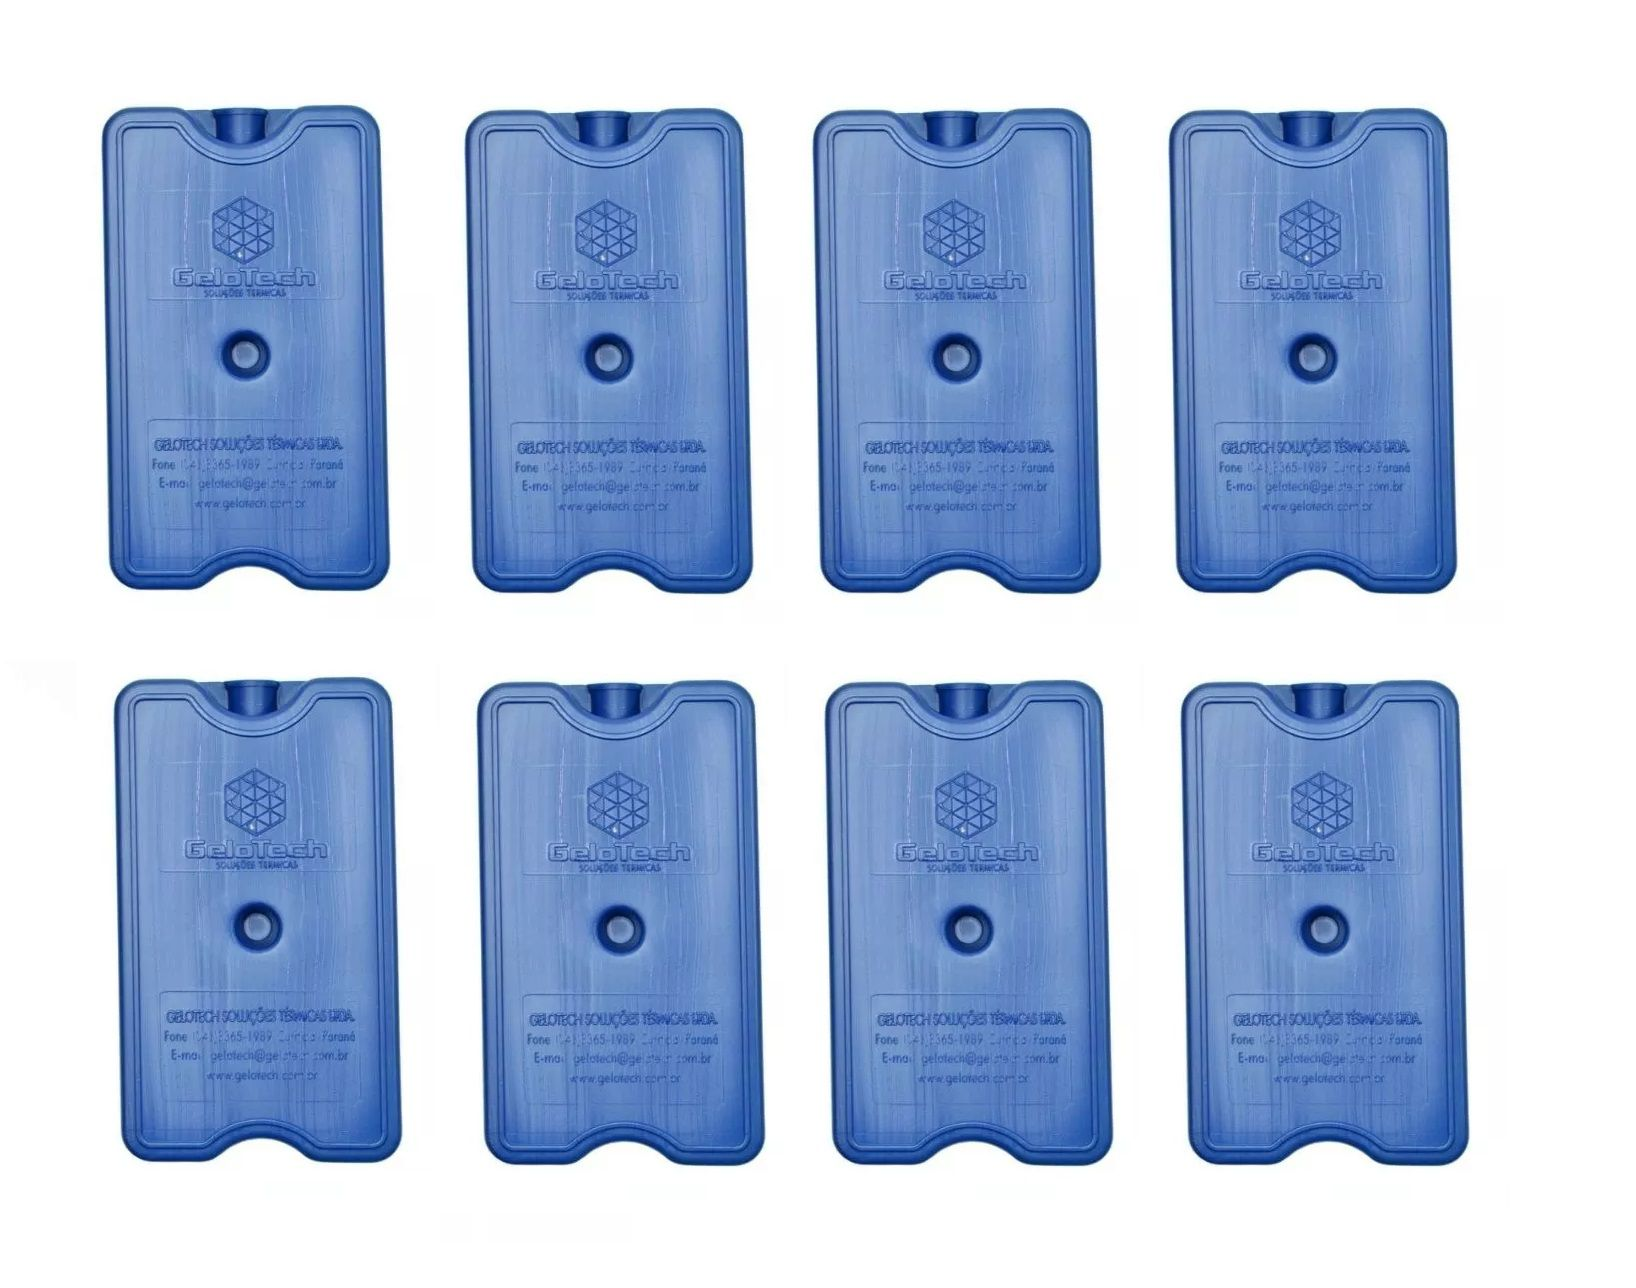 Placa Gelo-x Gel Rígido Reutilizável 500ml 17x10x3cm Gelotech Kit c/ 8 unidades  - Mix Eletro